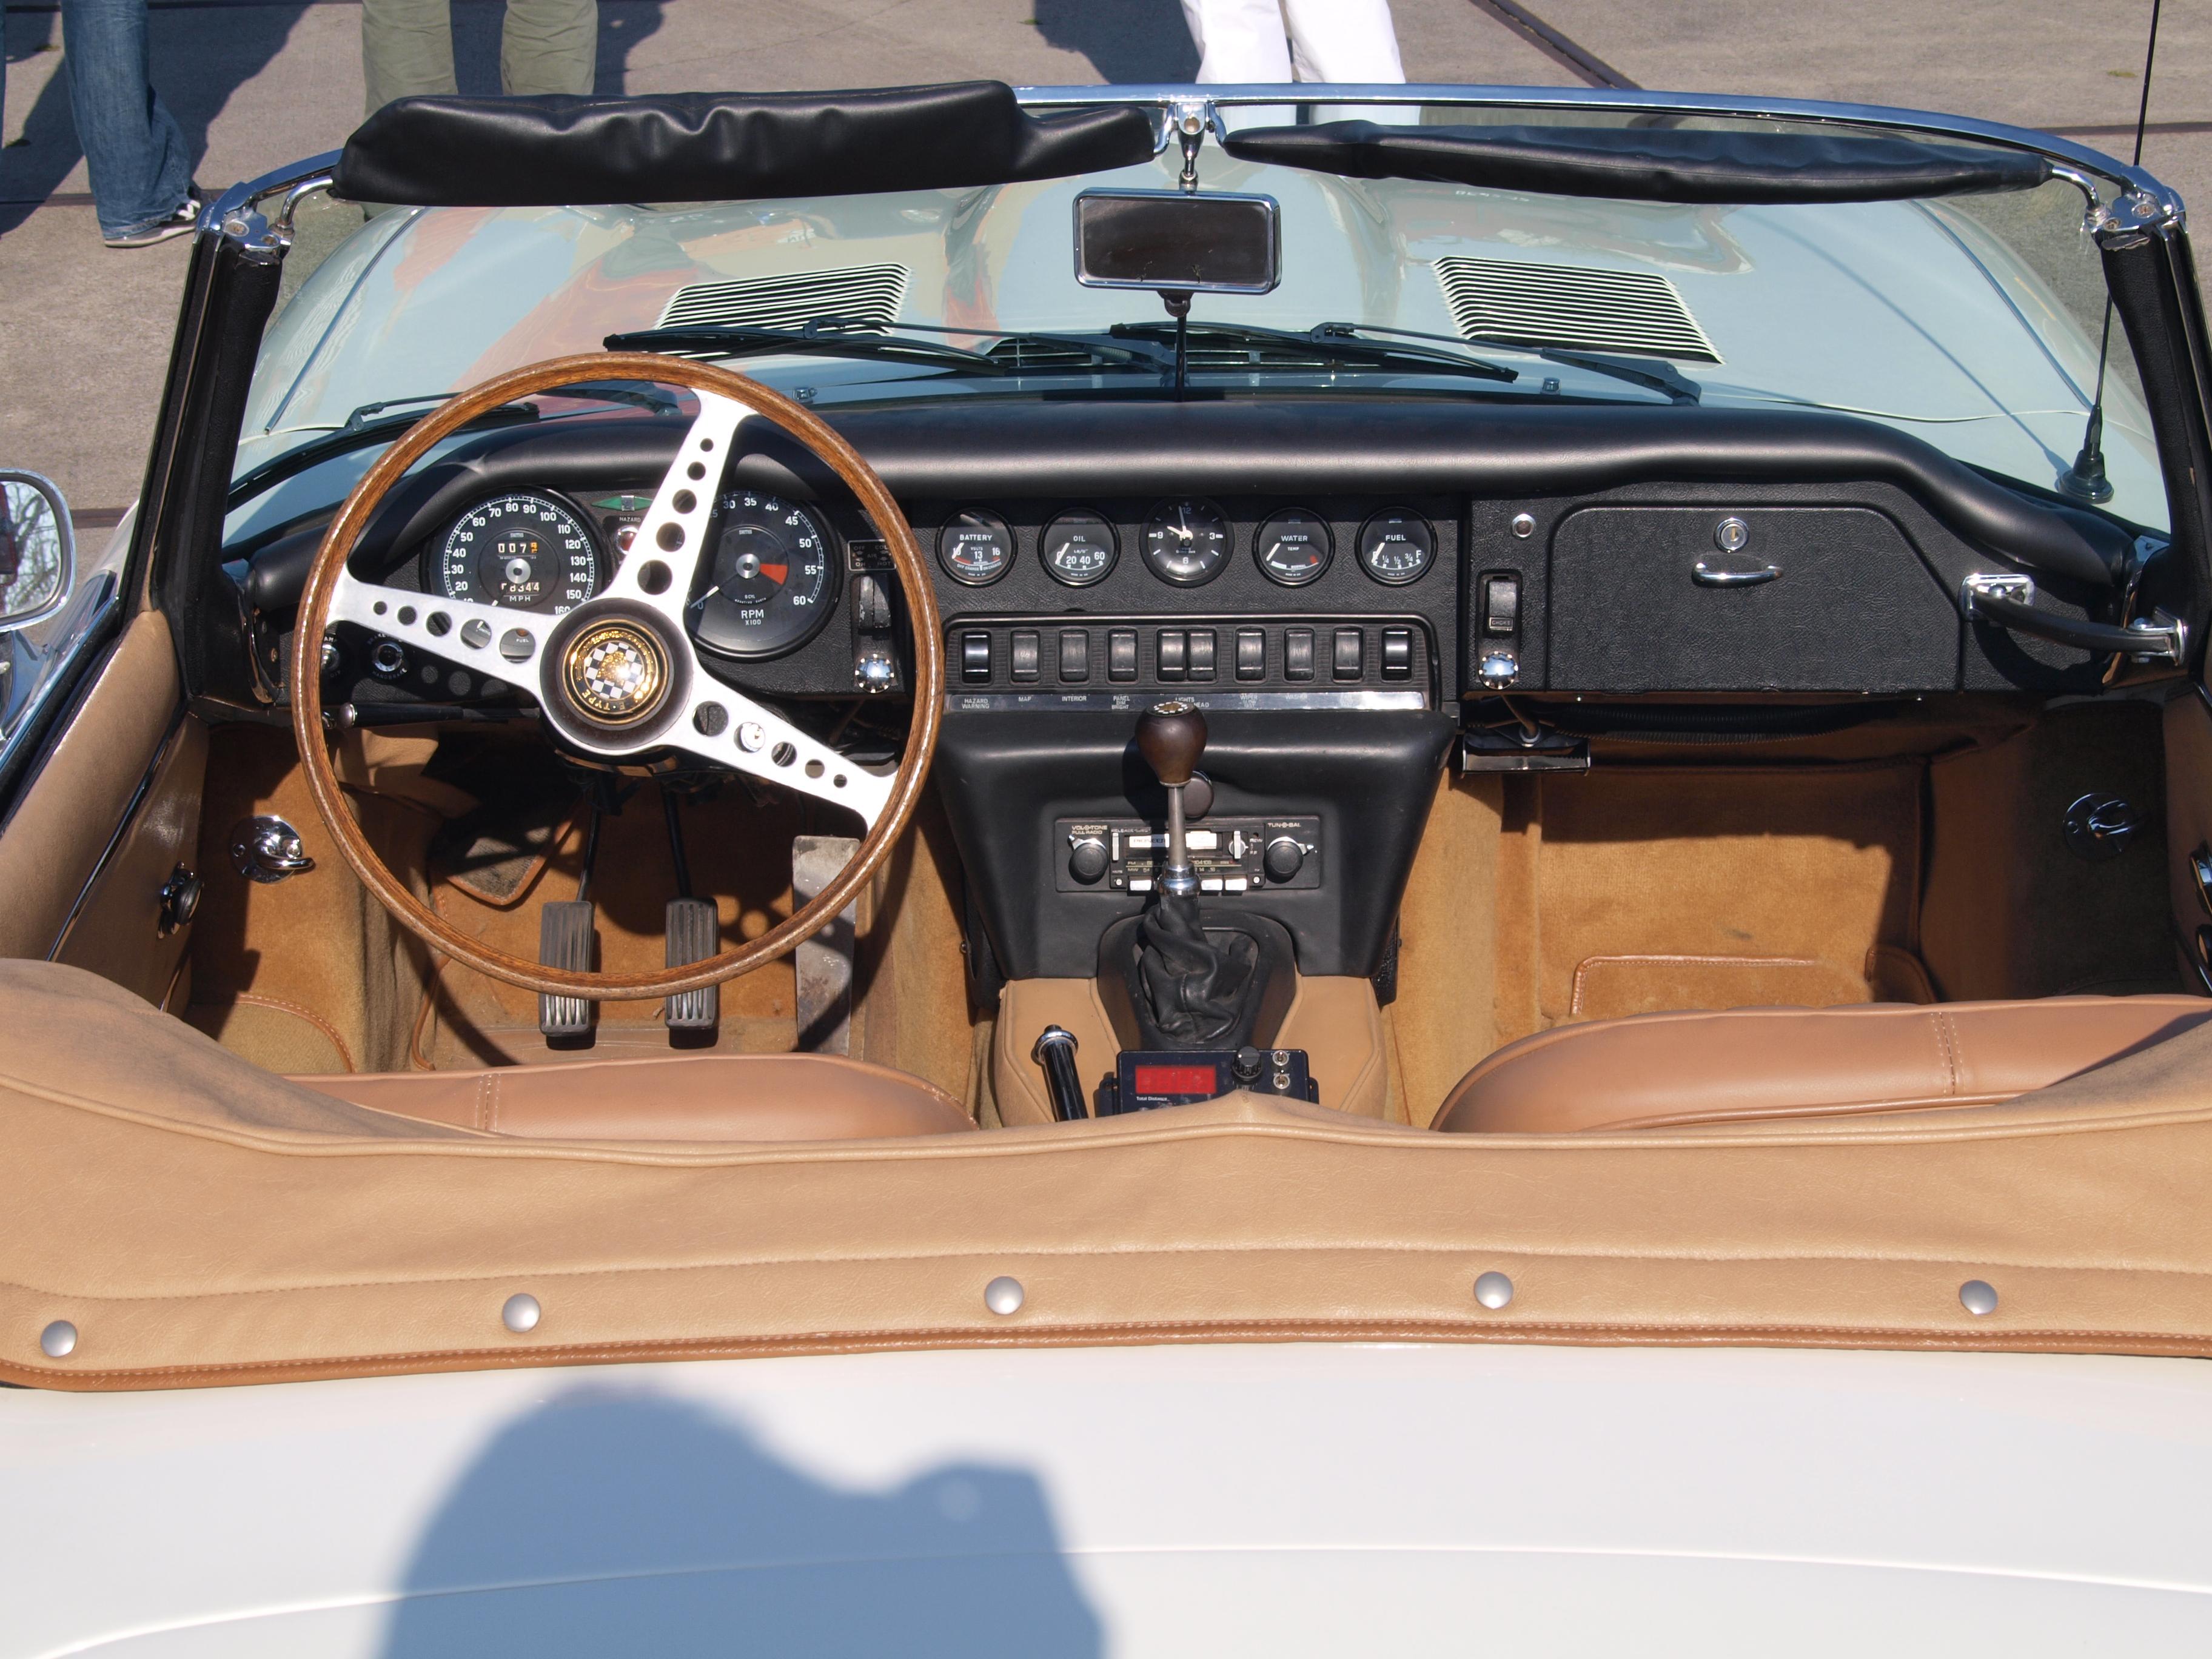 File:1968 Jaguar E-type cockpit, dashboard, Dutch licence